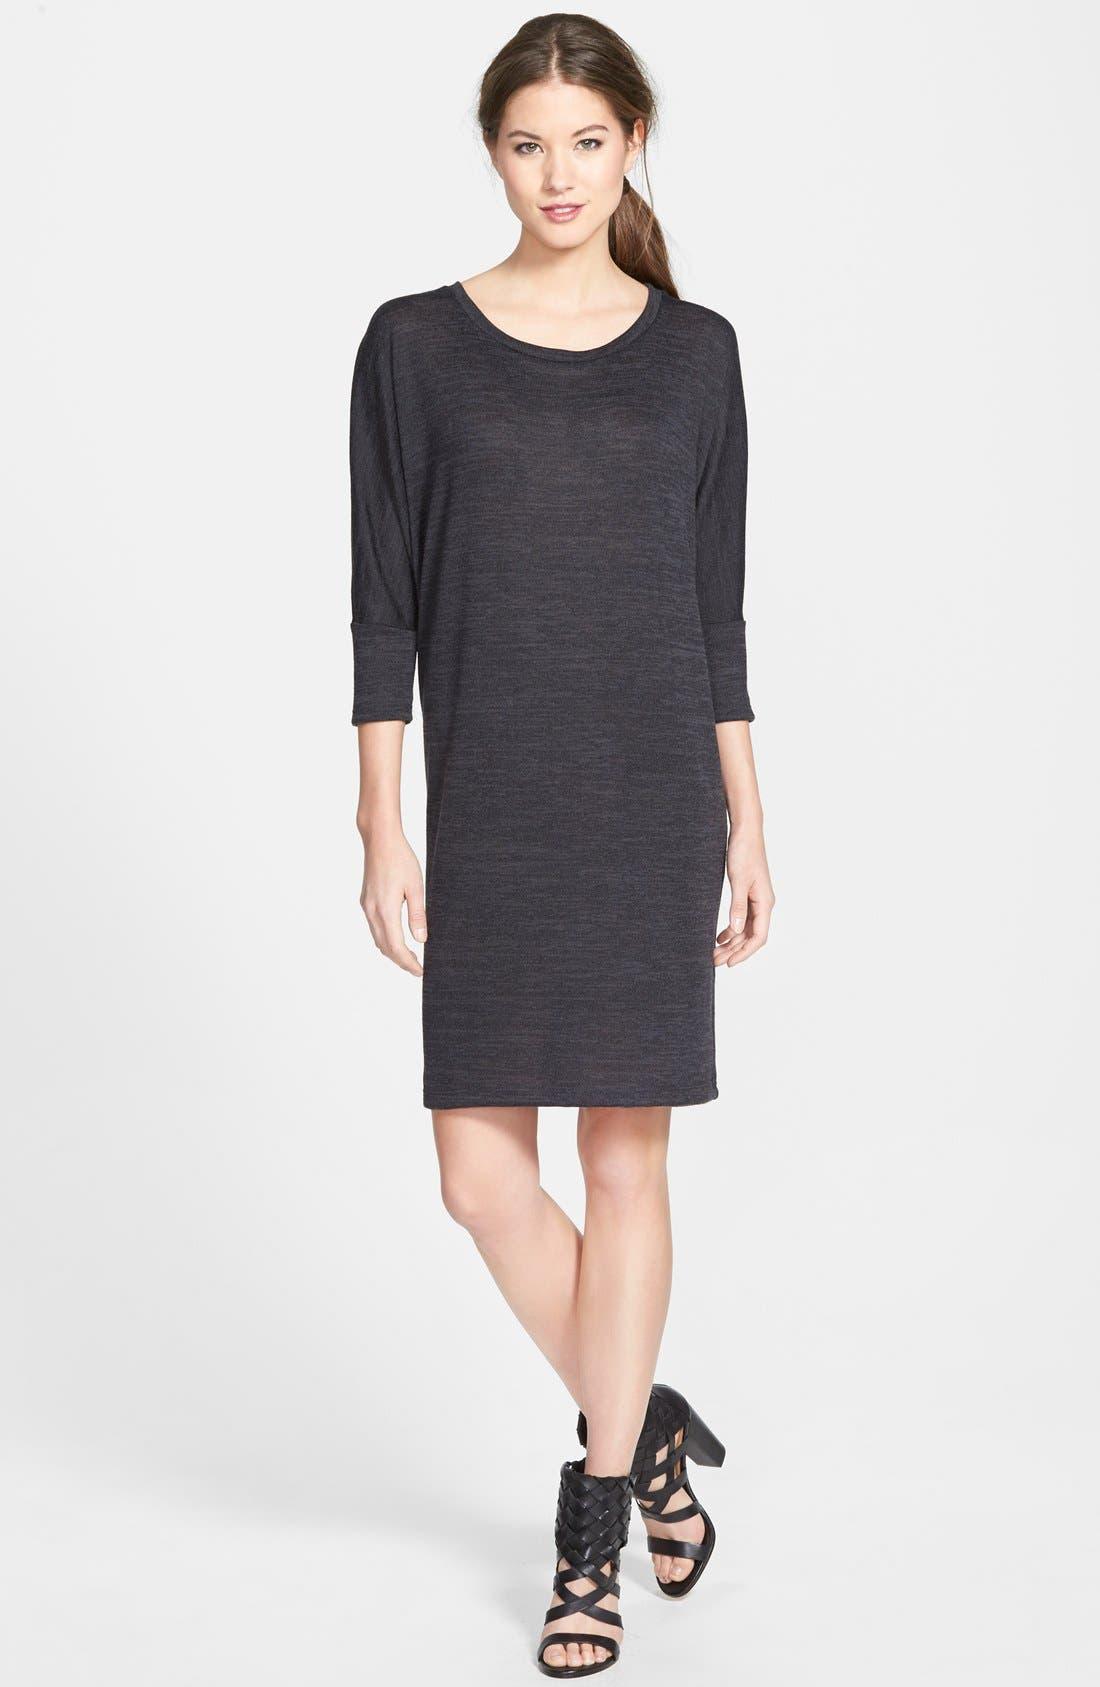 Alternate Image 1 Selected - Bobeau Three Quarter Dolman Sleeve Sweater Dress